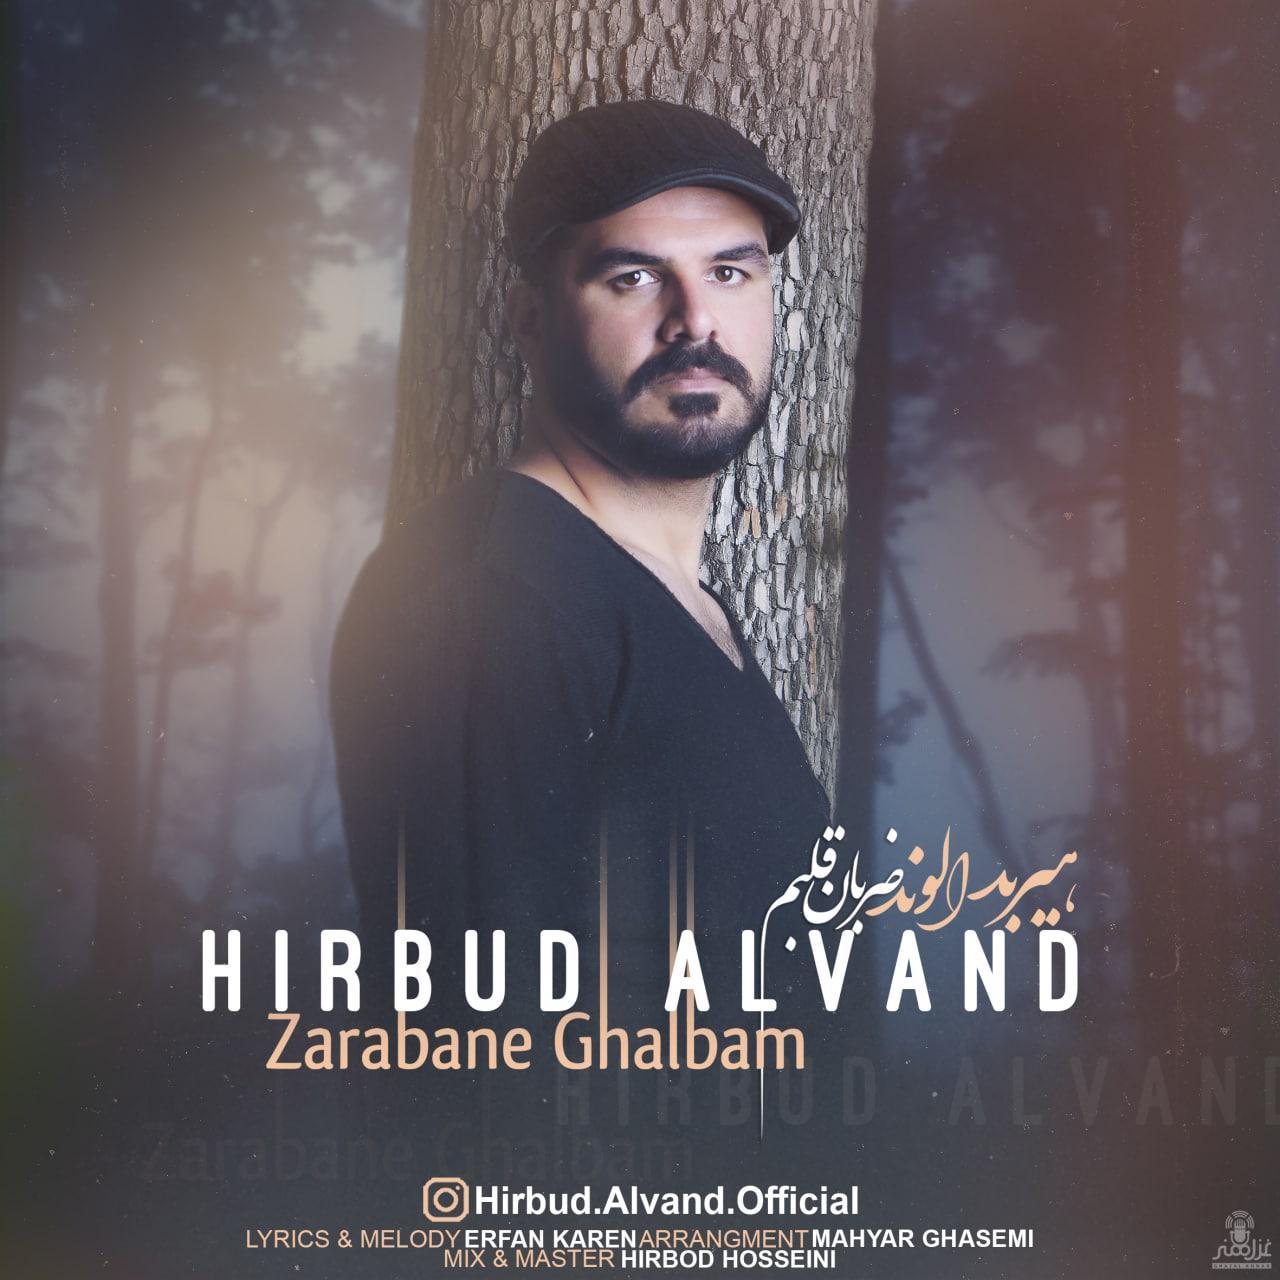 Hirbud Alvand – Zarabane Ghalbam